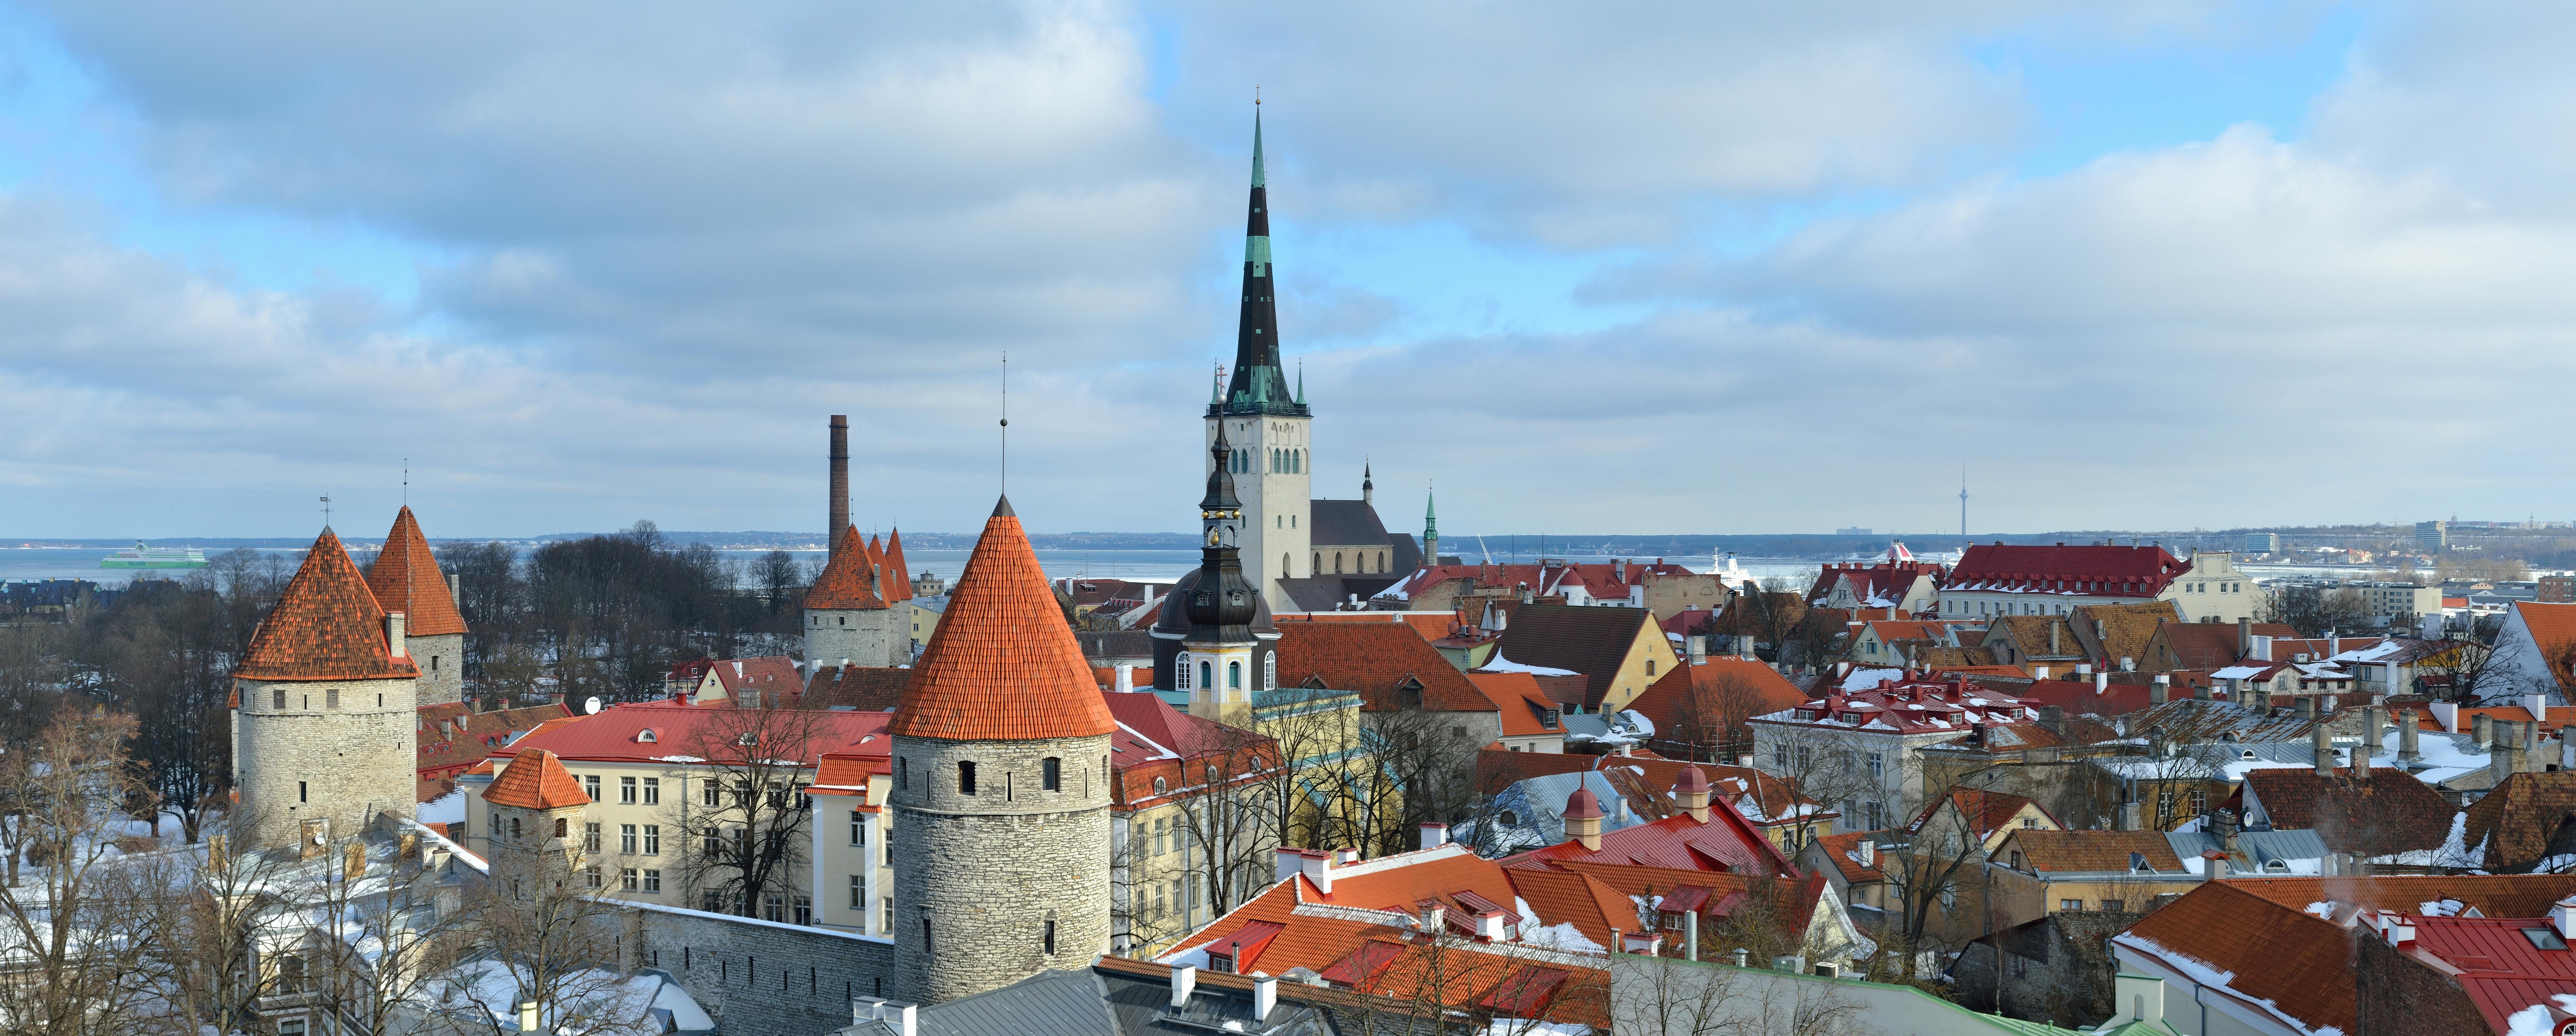 Depiction of Historia de Estonia